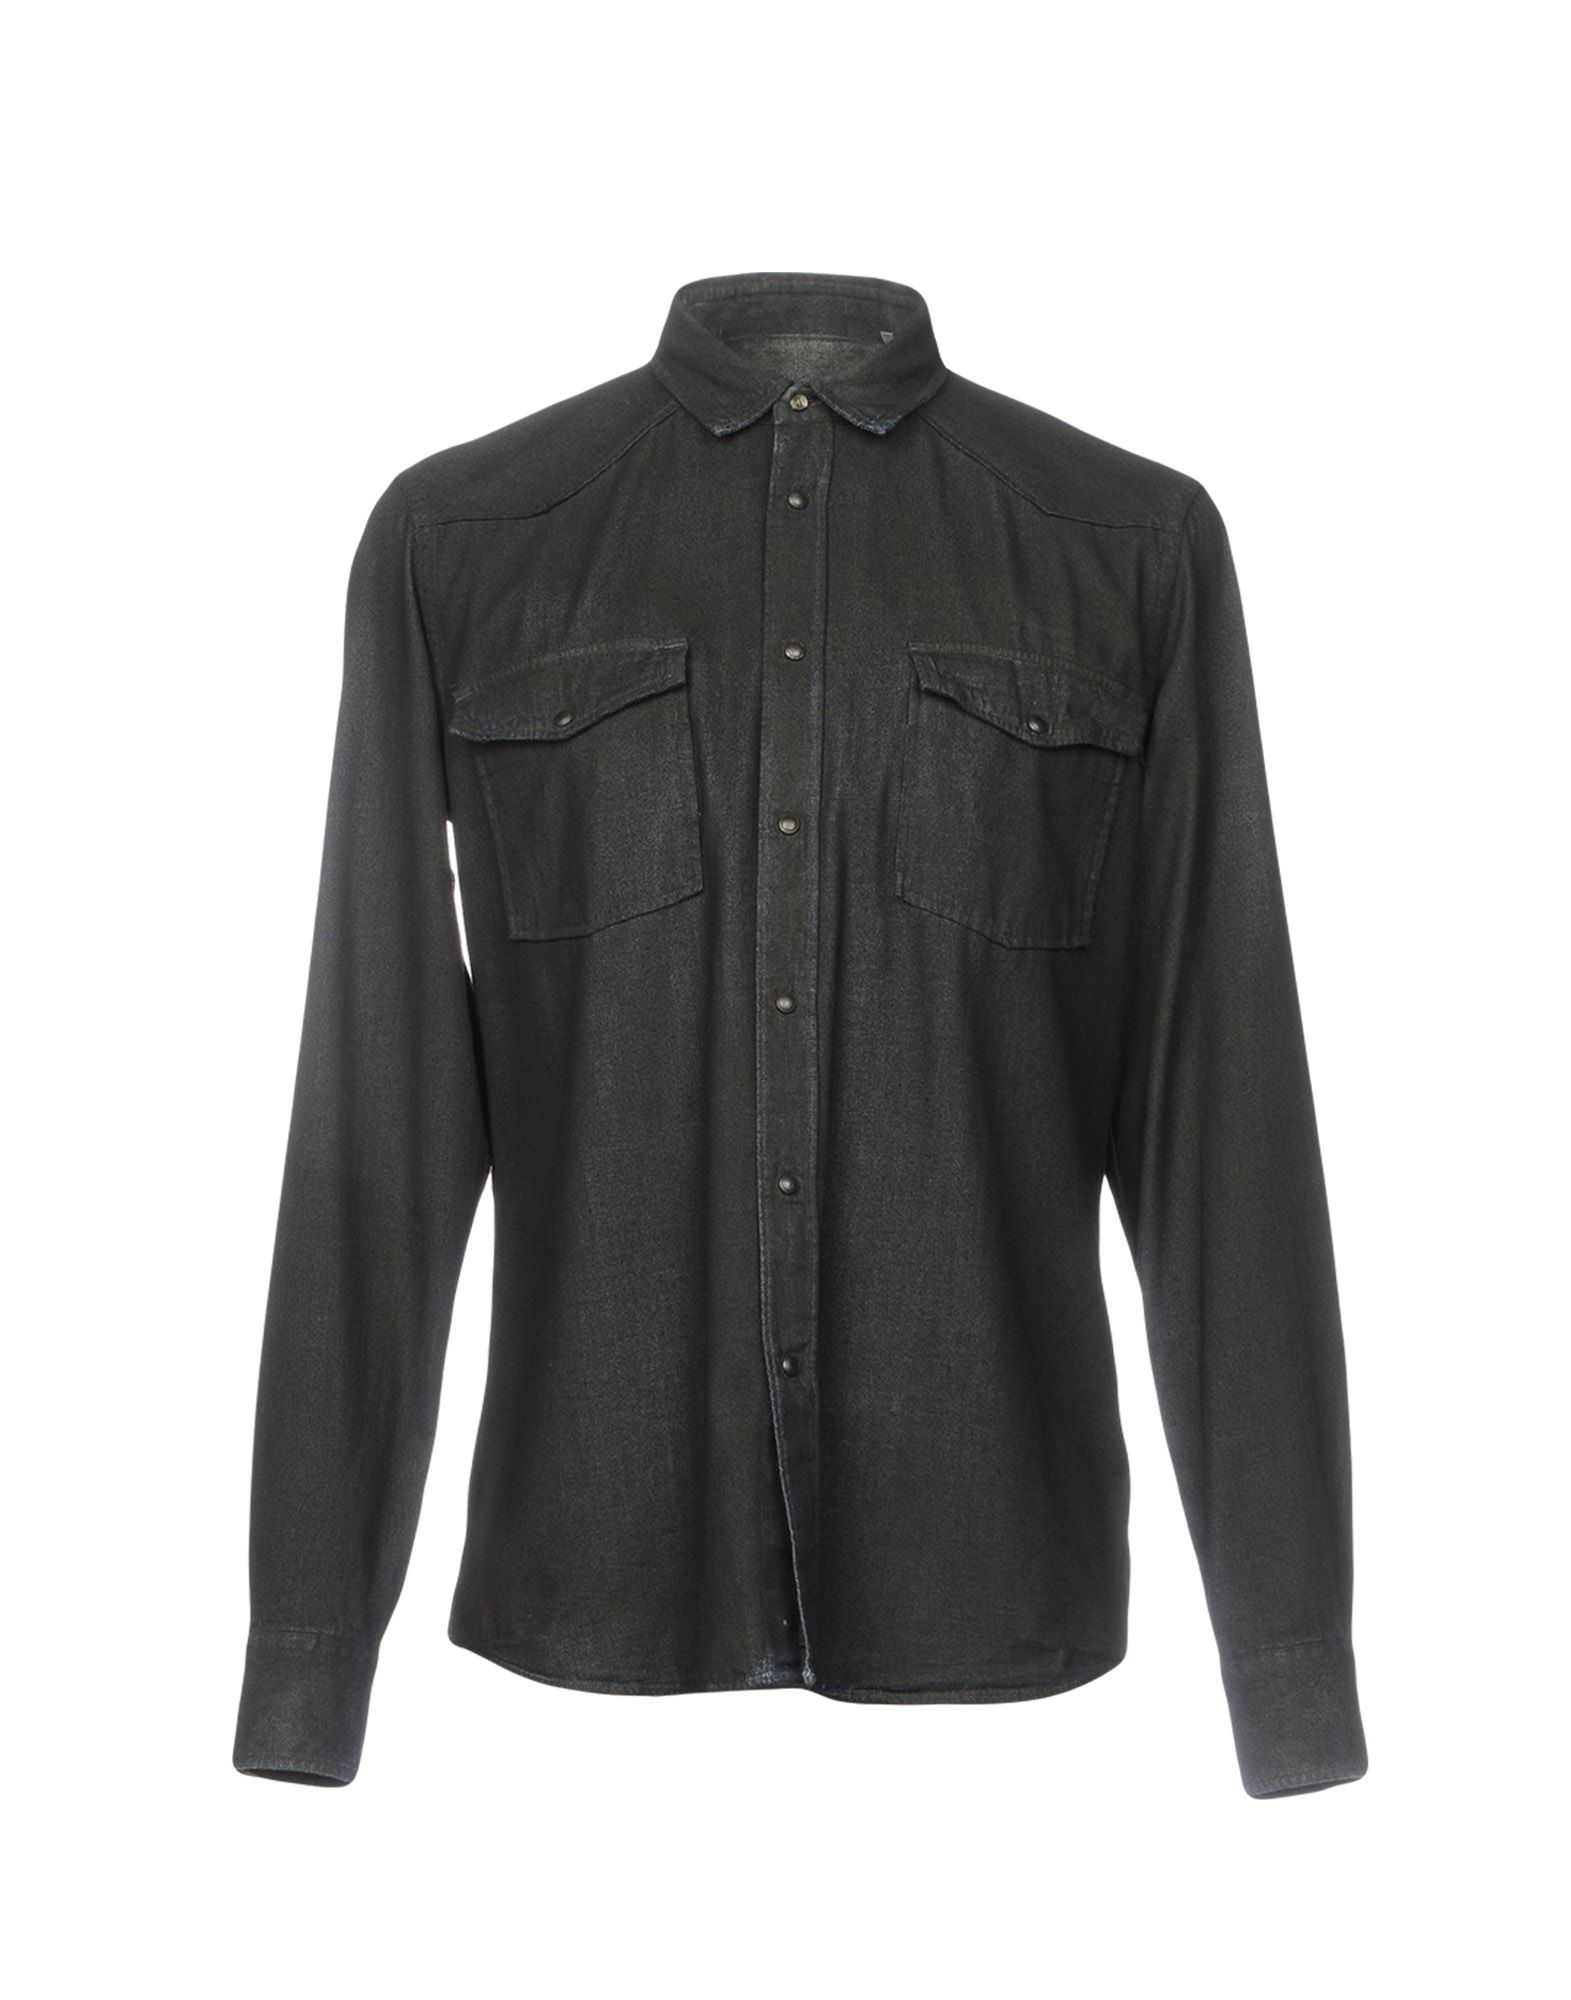 MAURO GRIFONI Джинсовая рубашка джинсовая рубашка quelle arizona 610860